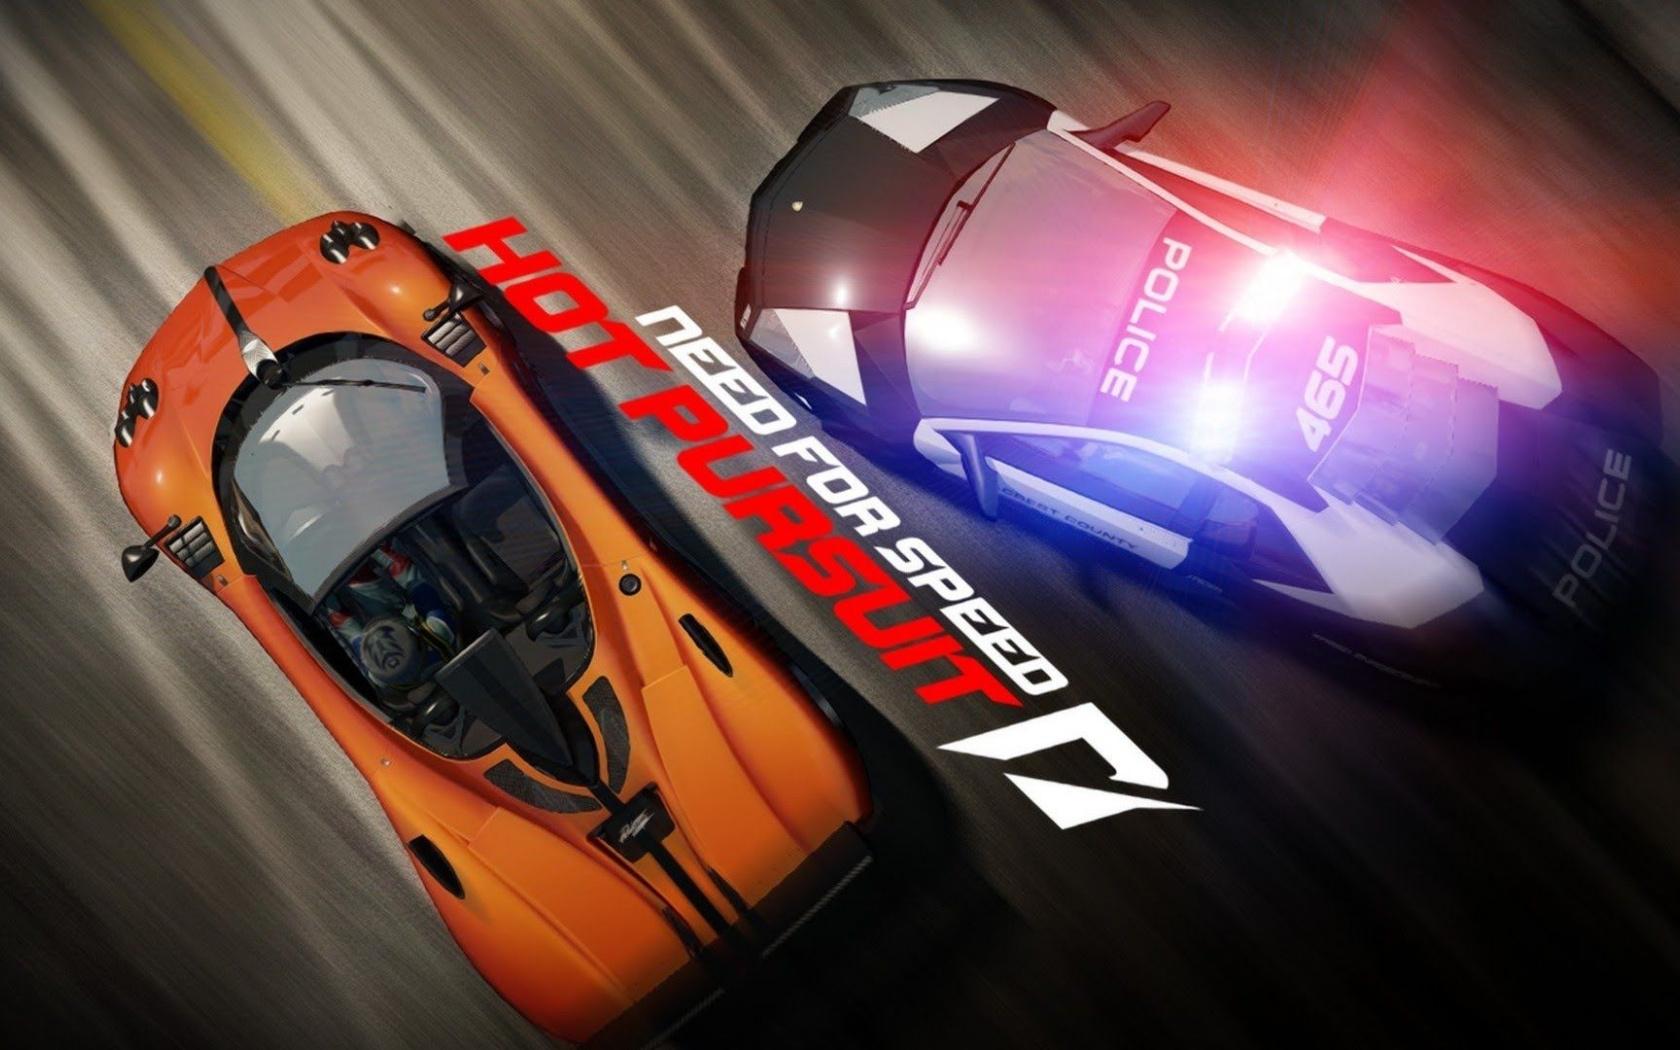 На Amazon обнаружили страницу ремастера Need for Speed: Hot Pursuit (2010) — релиз намечен на 13 ноября